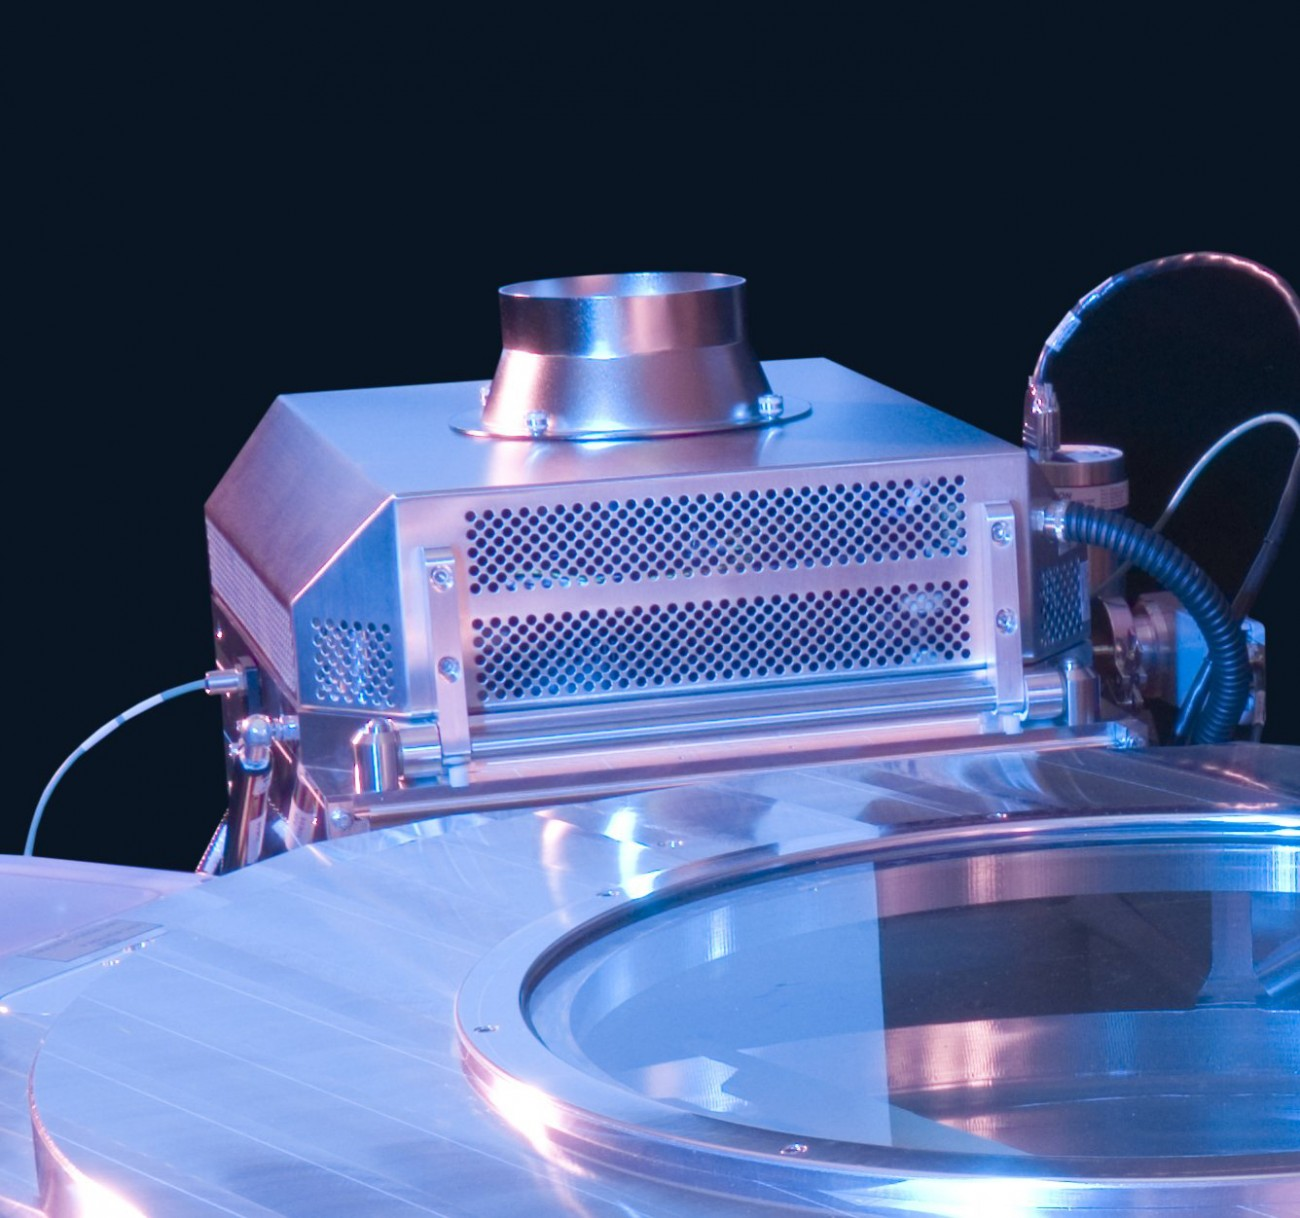 Delta 174 Plasma Enhanced Chemical Vapor Deposition Systems